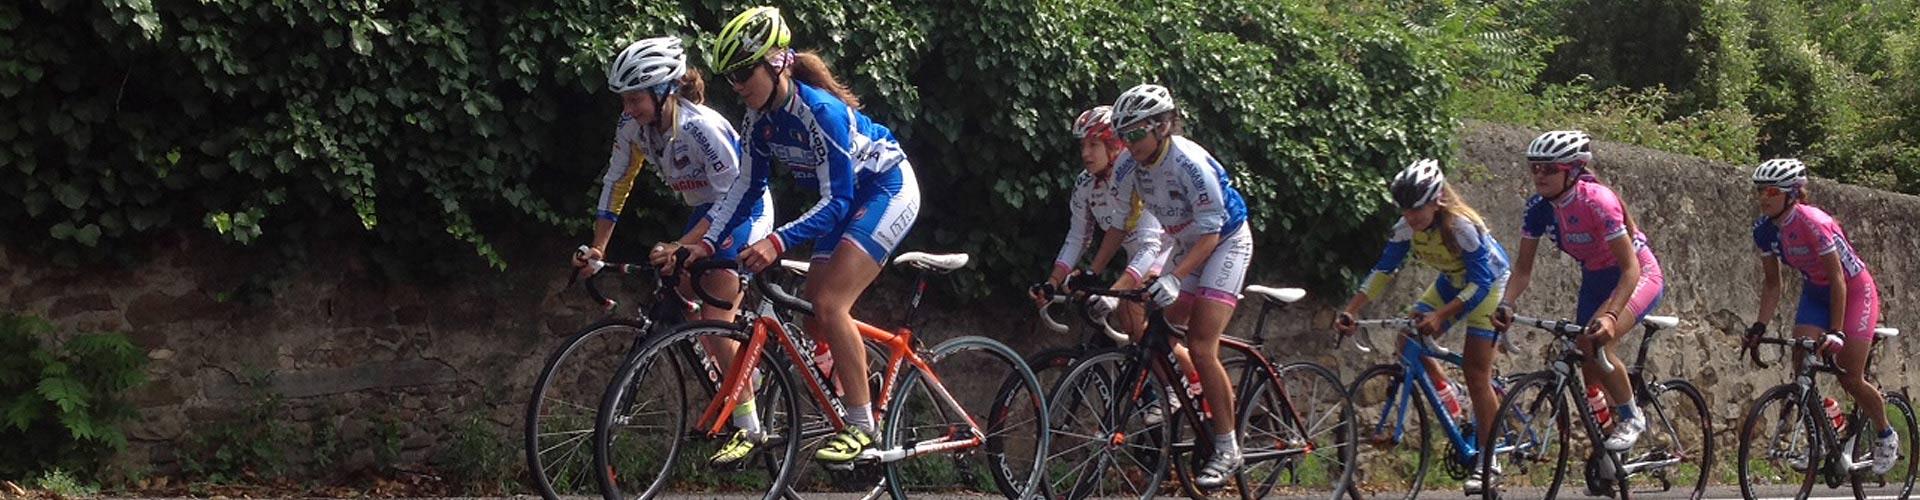 San-Baronto-destination of trails and races